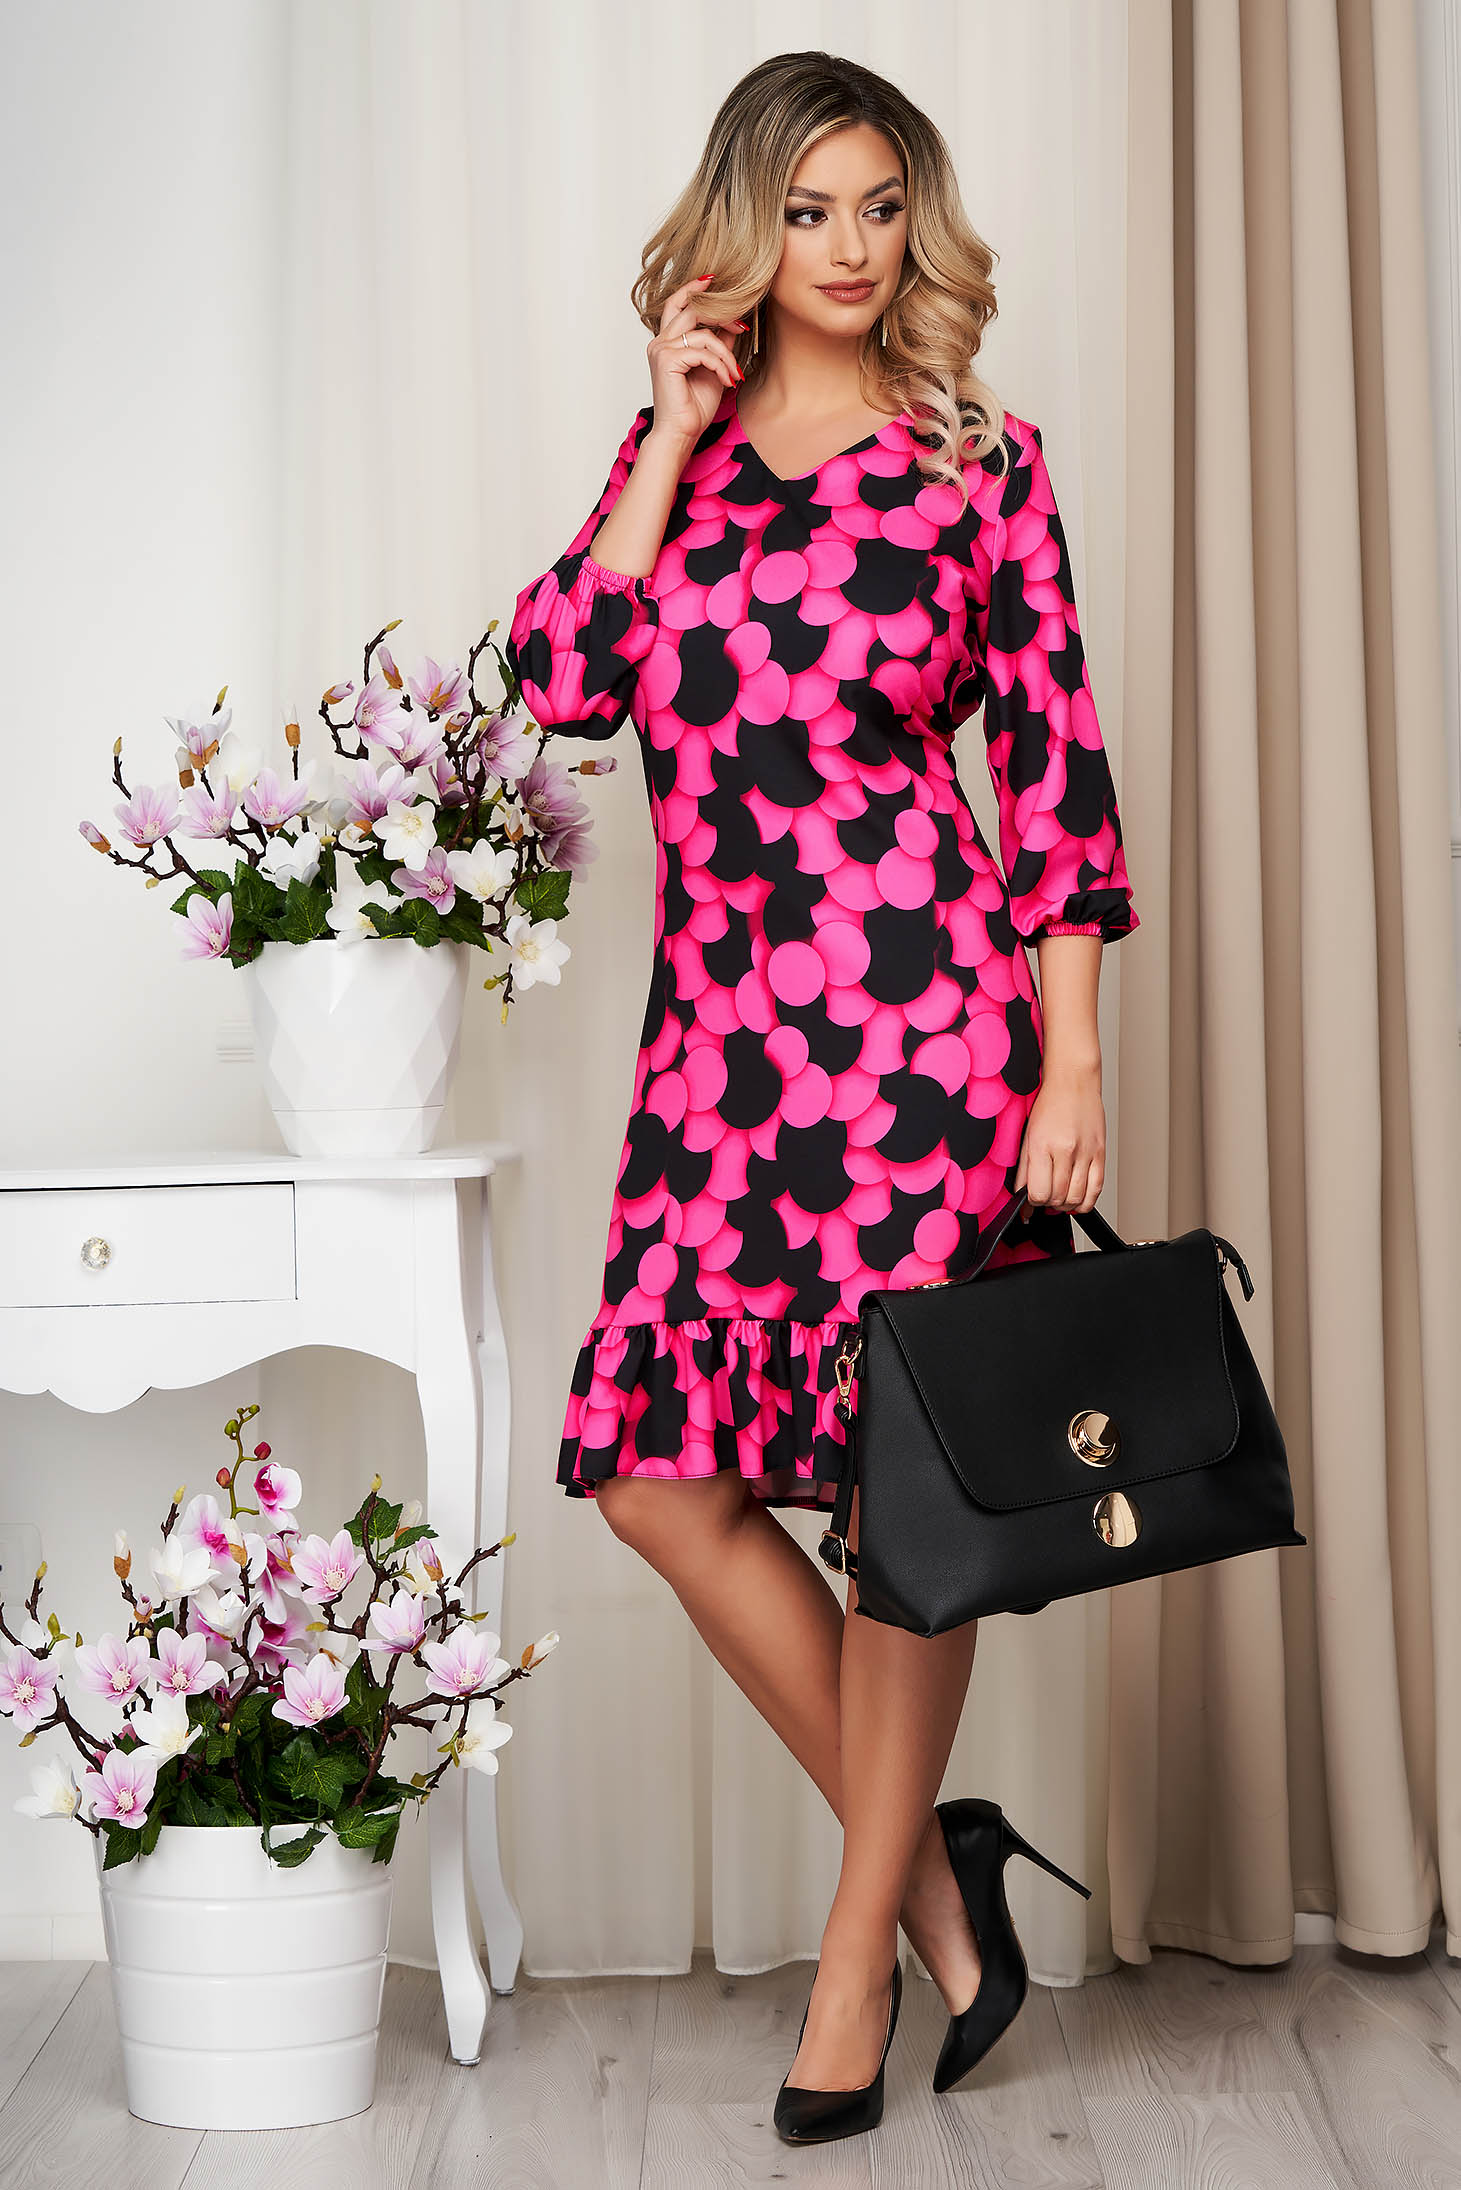 Rochie StarShinerS roz cu croi larg cu volanase cu imprimeuri grafice din material neelastic